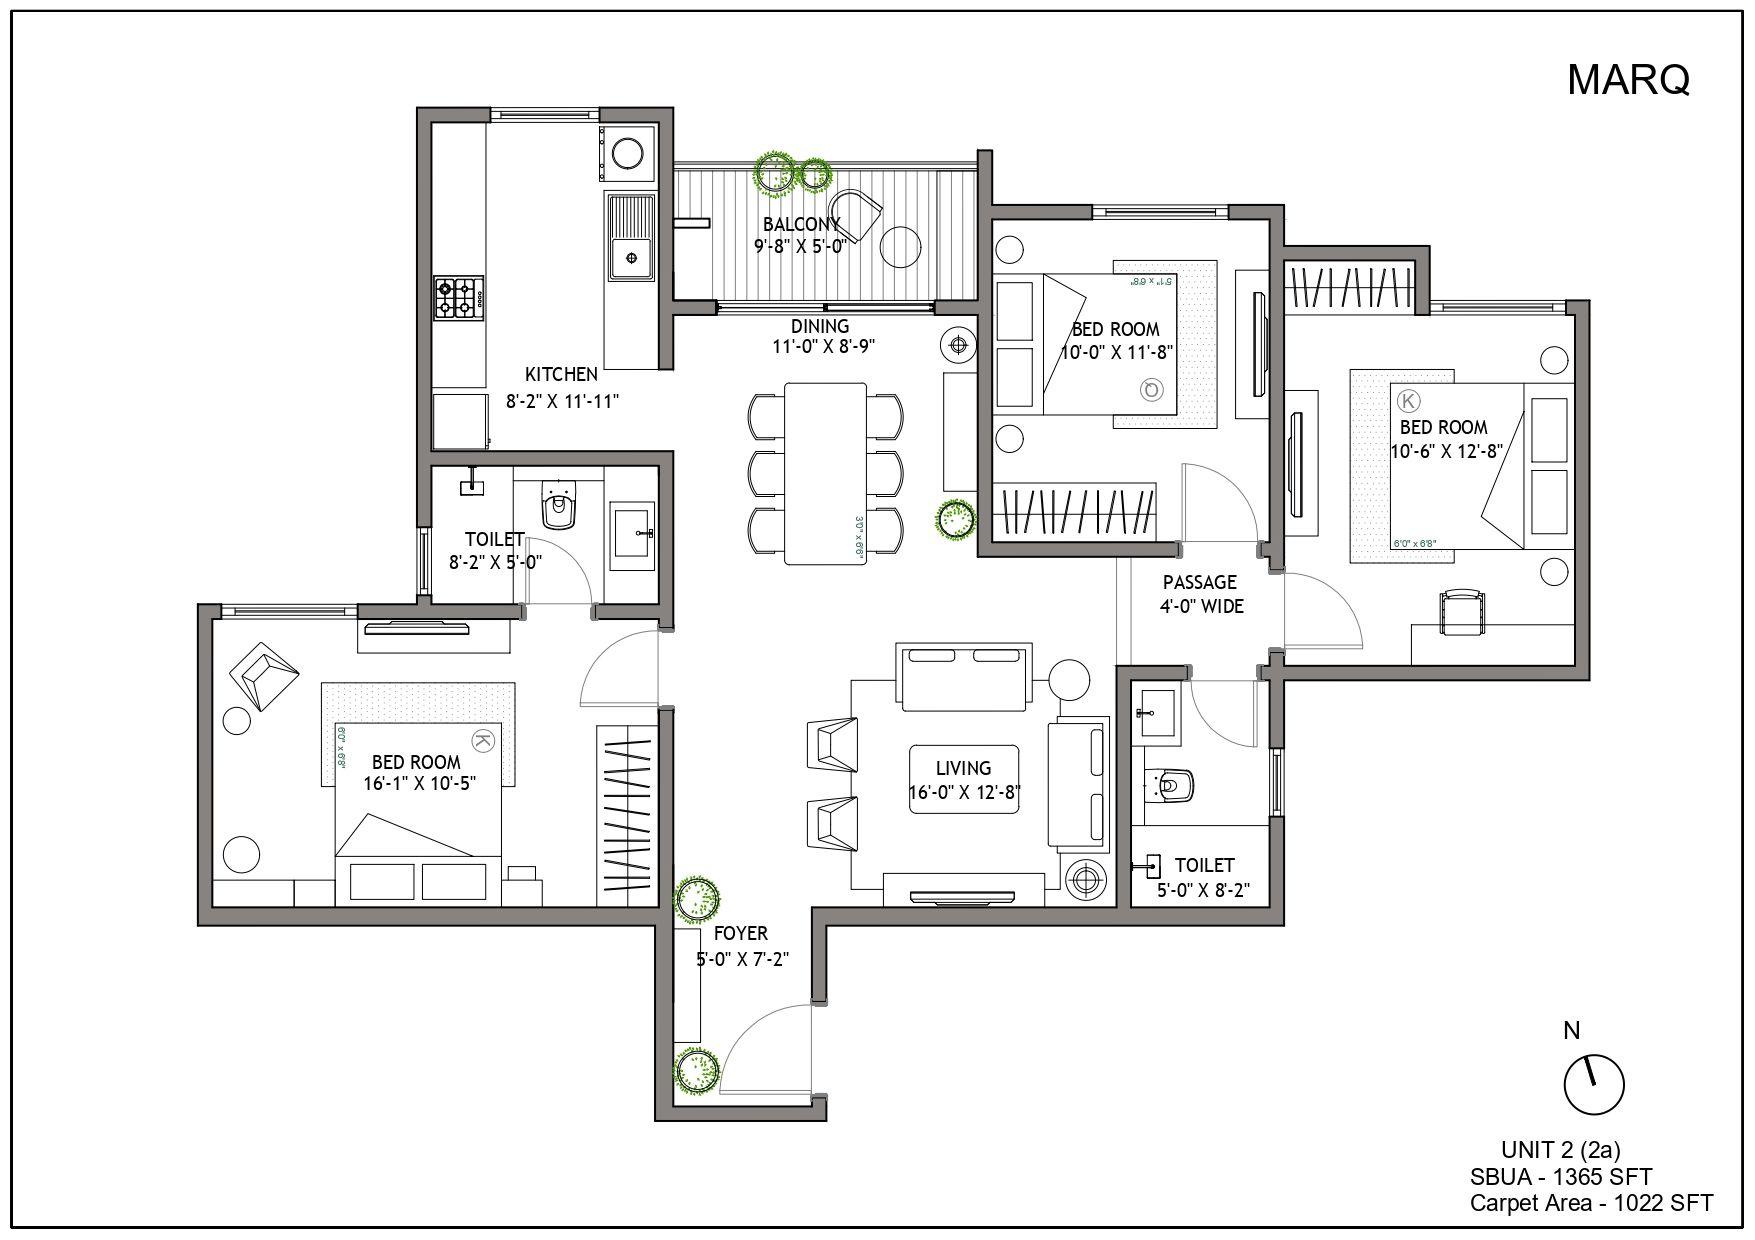 Assetz Marq Floor Plan Floor Plans Marq How To Plan